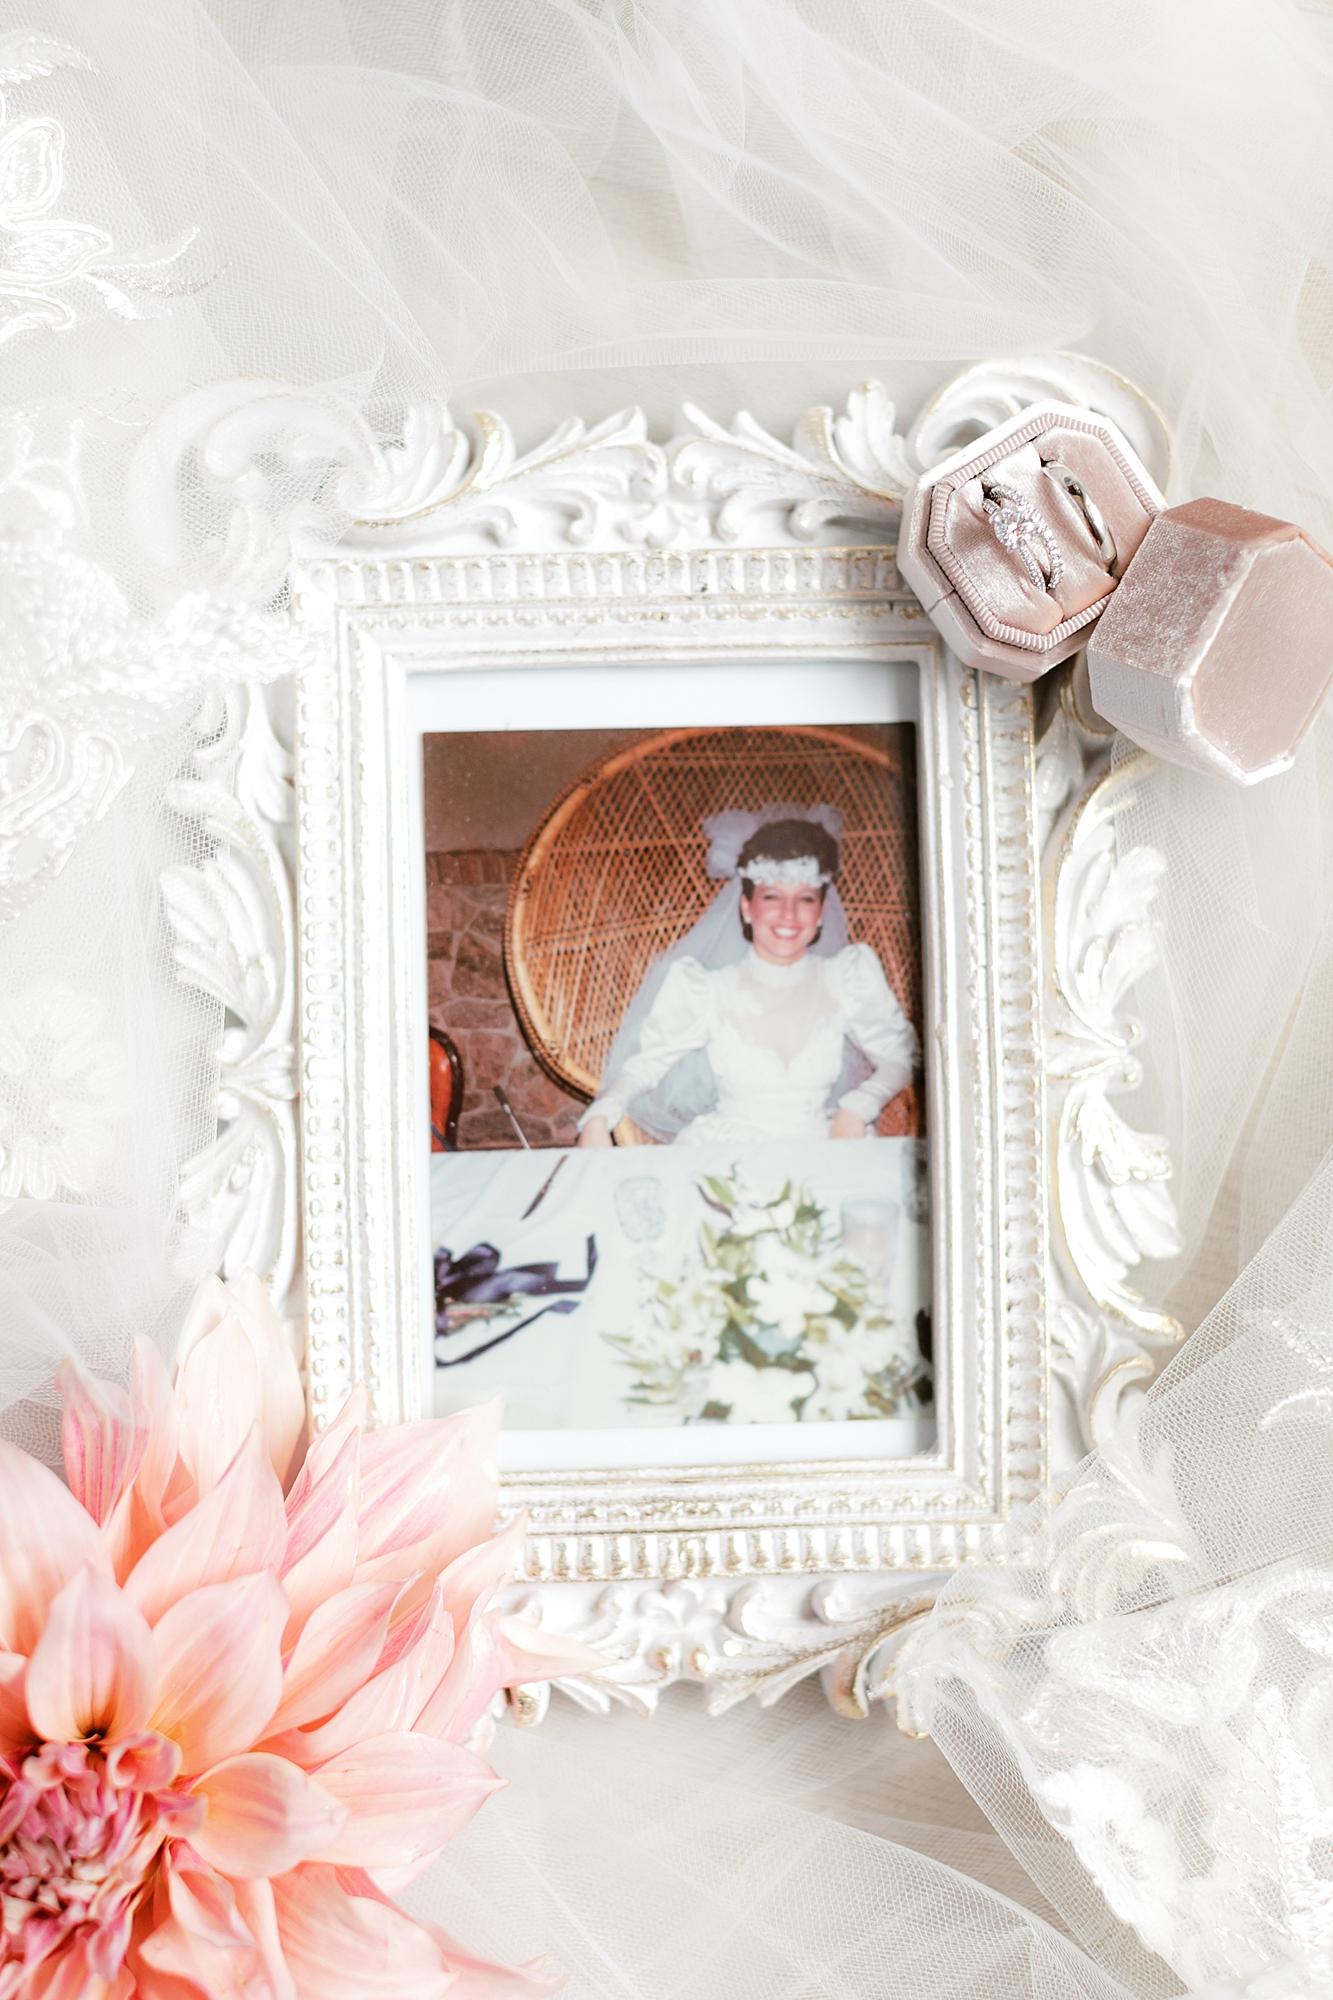 Princeton New Jersey Film Wedding Photographer Princeton University Wedding Photography by Magdalena Studios NJ Wedding Photographer6